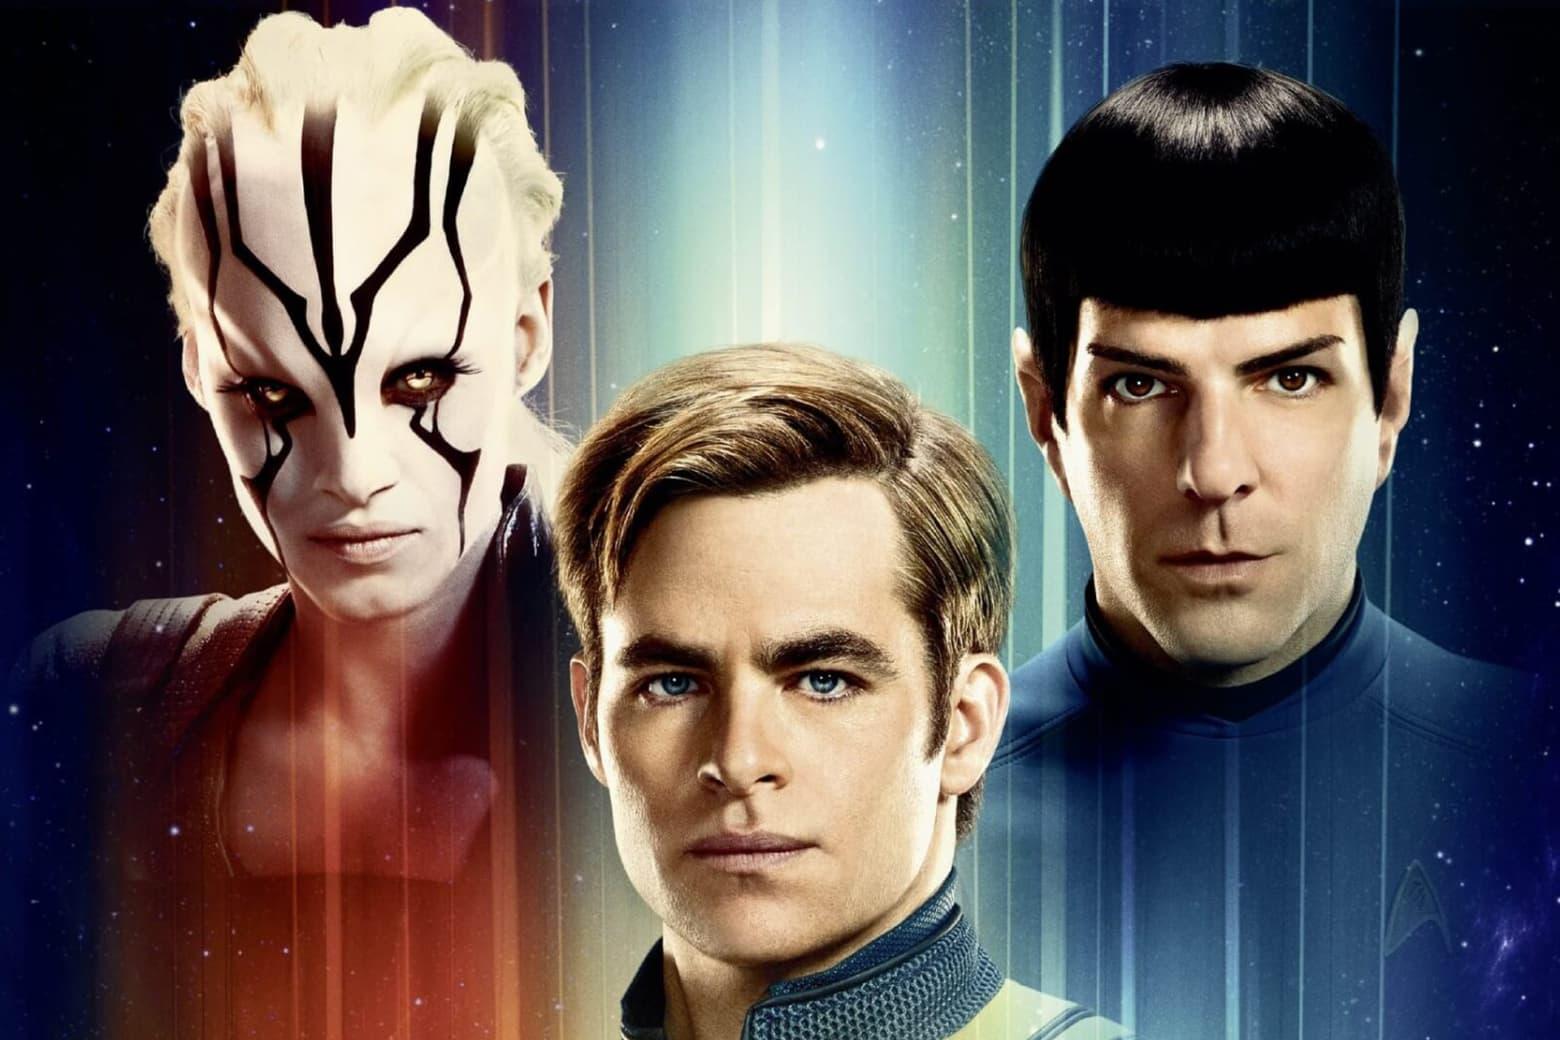 Every 'Star Trek' Film Ranked from Best to Worst | Futurism